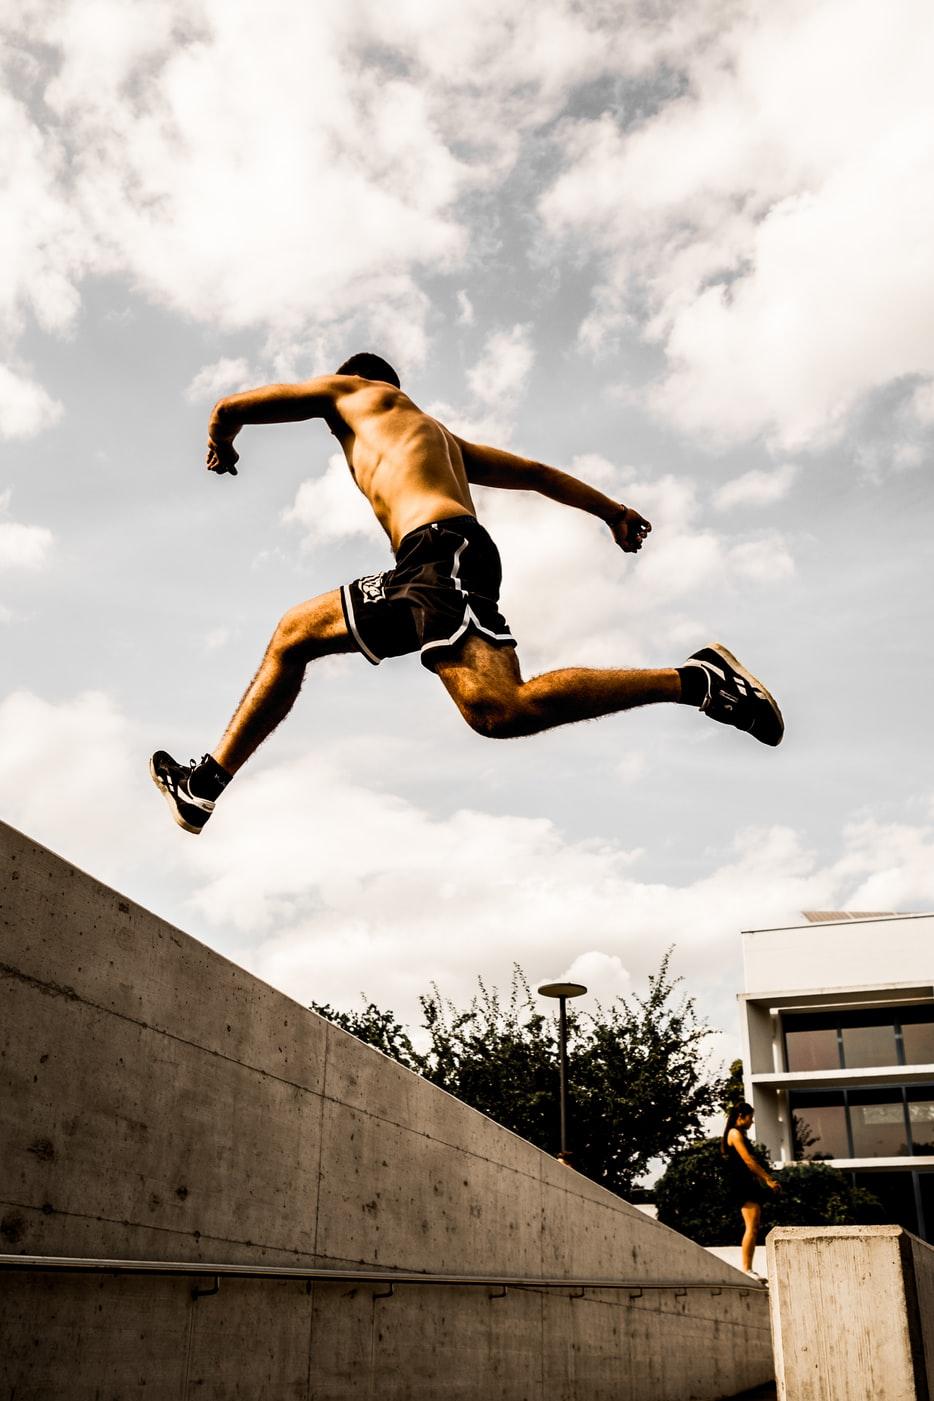 cinque-sport-estremi-per-mantenere-il-focus